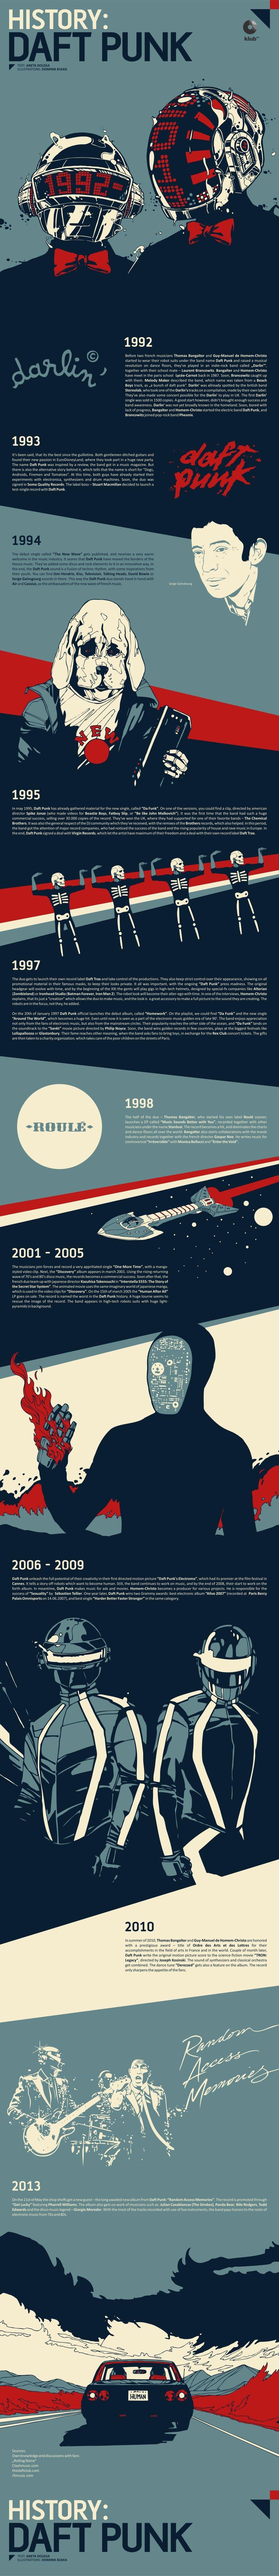 DaftPunk-Infographic